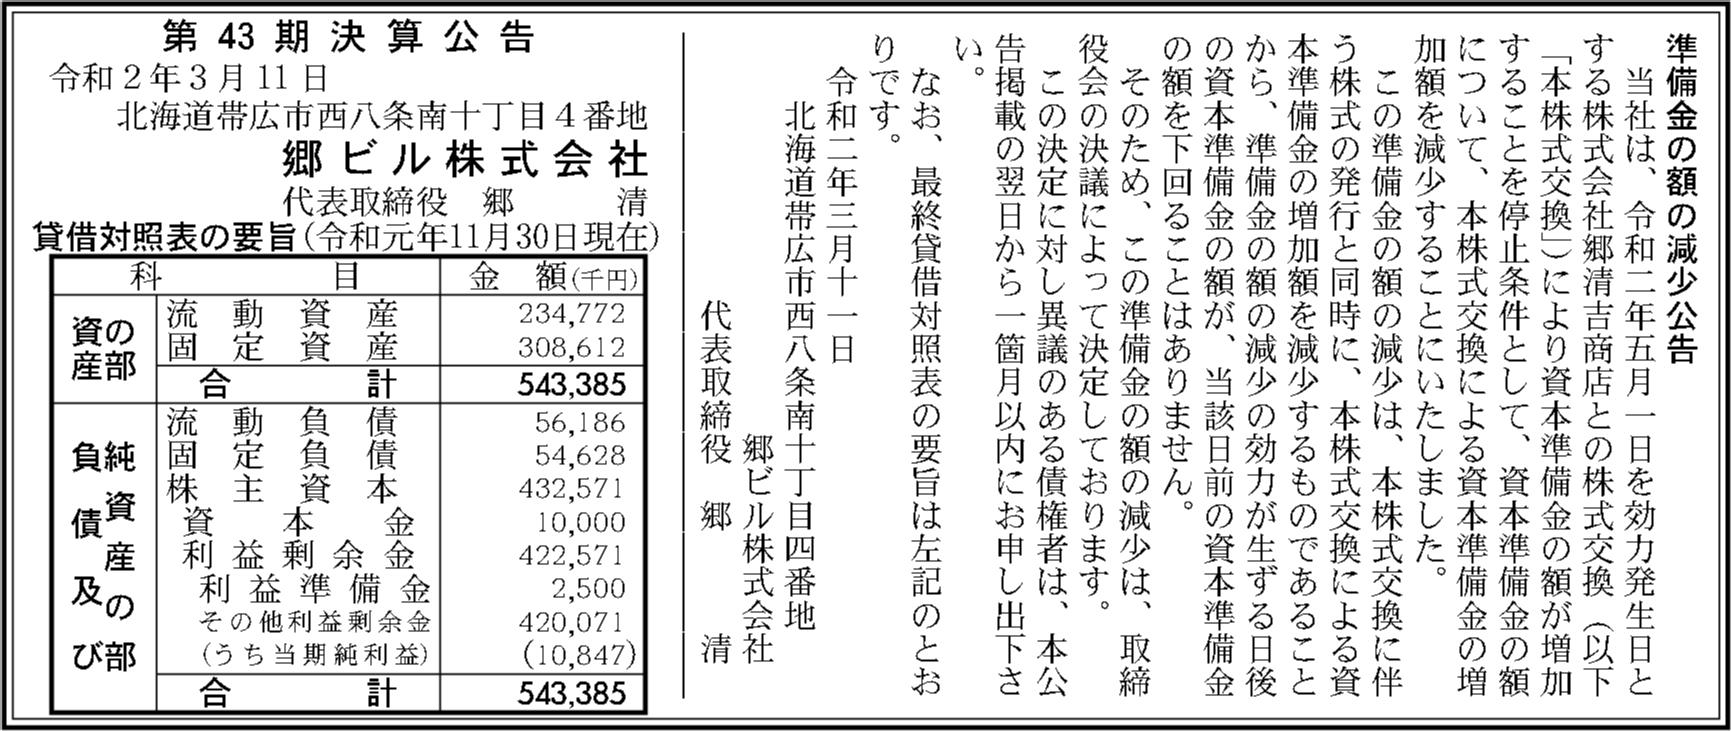 0062 0bce506e109fd15ddd840cbc07545808462ebc200adc55f7d2abd7a481f2180b737cd3159f0bf38bd116e331d6a796c2e530926d7d36445e9f6815a50f0aa710 02